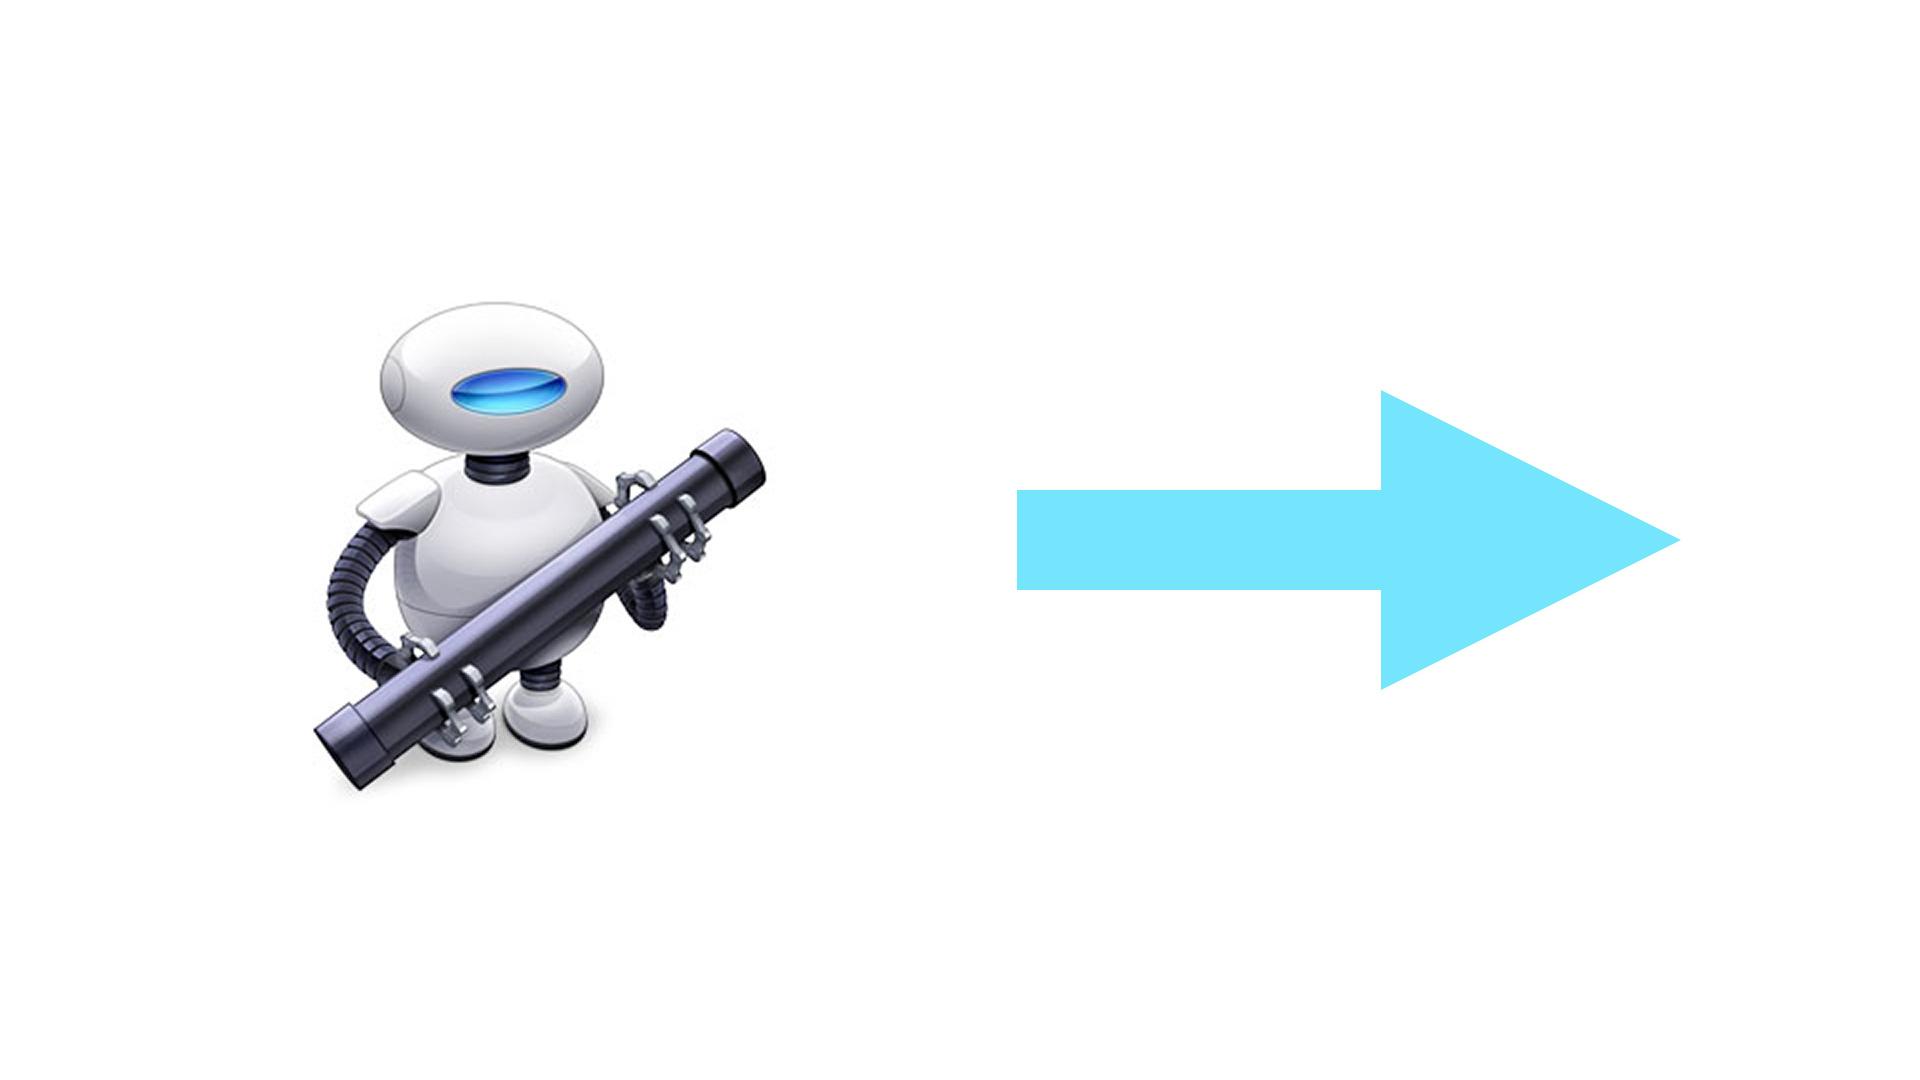 Apple's Automator – The Ultimate Workflow Tool | Photofocus